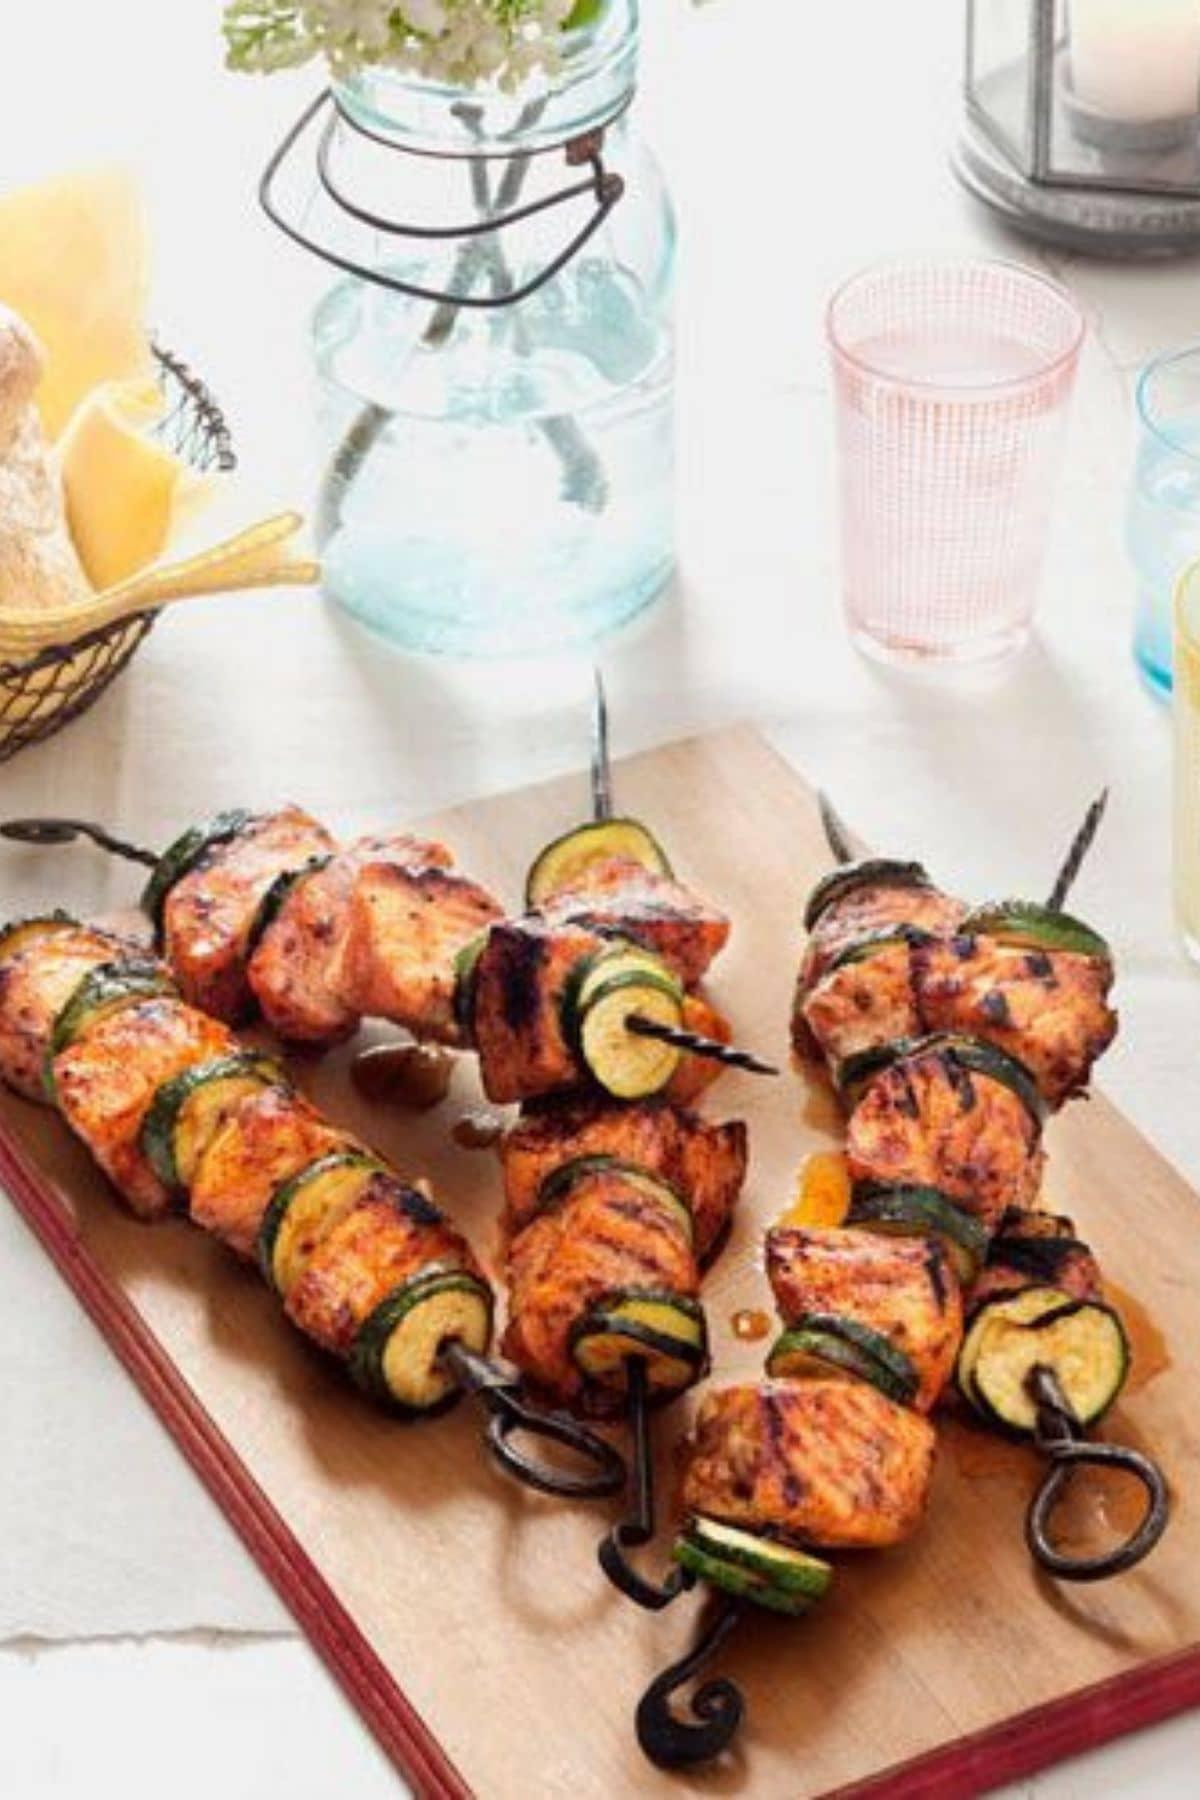 Salmon and zucchini skewers on cutting board